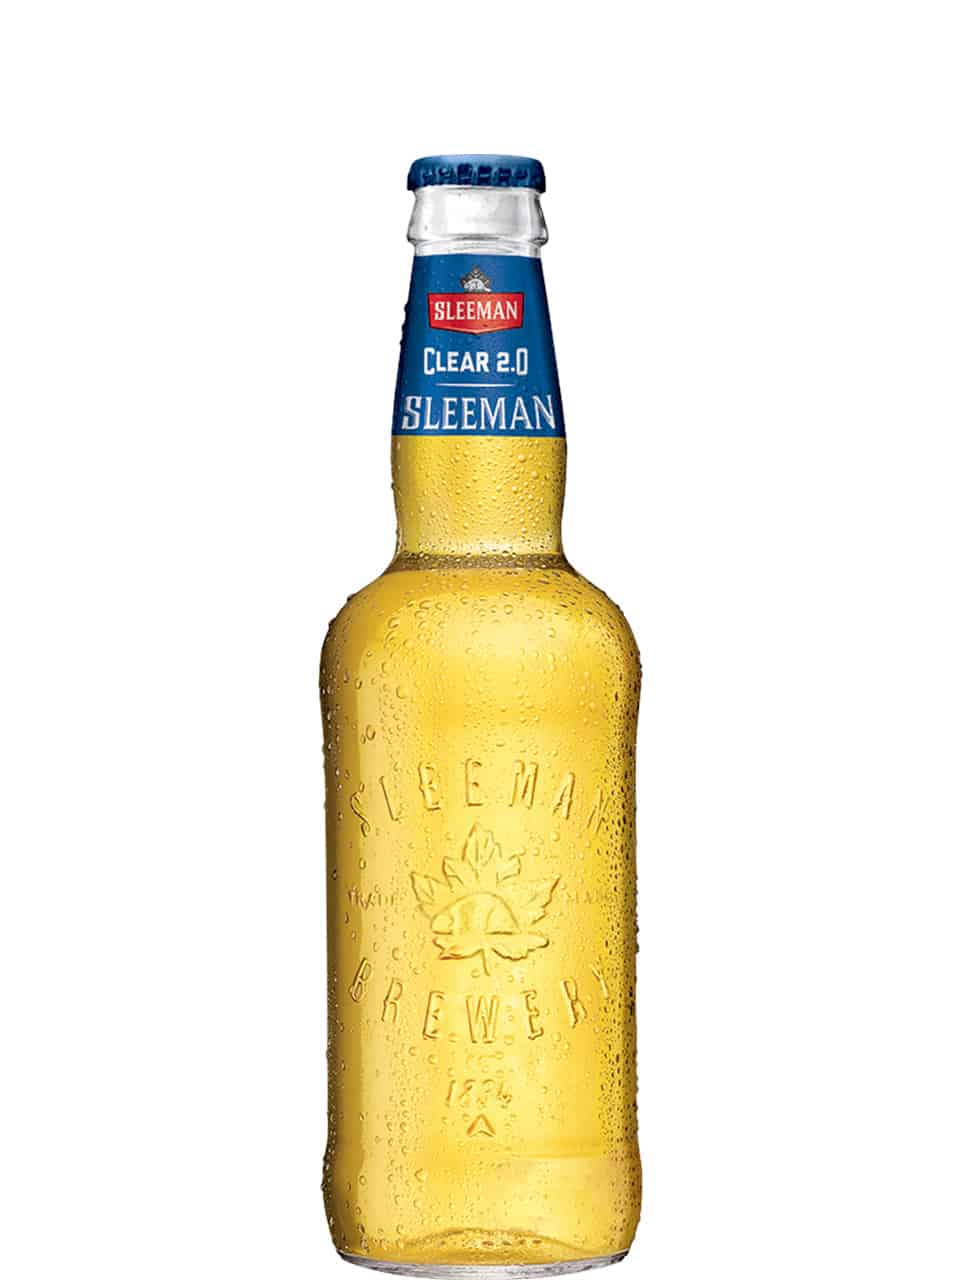 Sleeman Clear 2.0 12pk Bottles